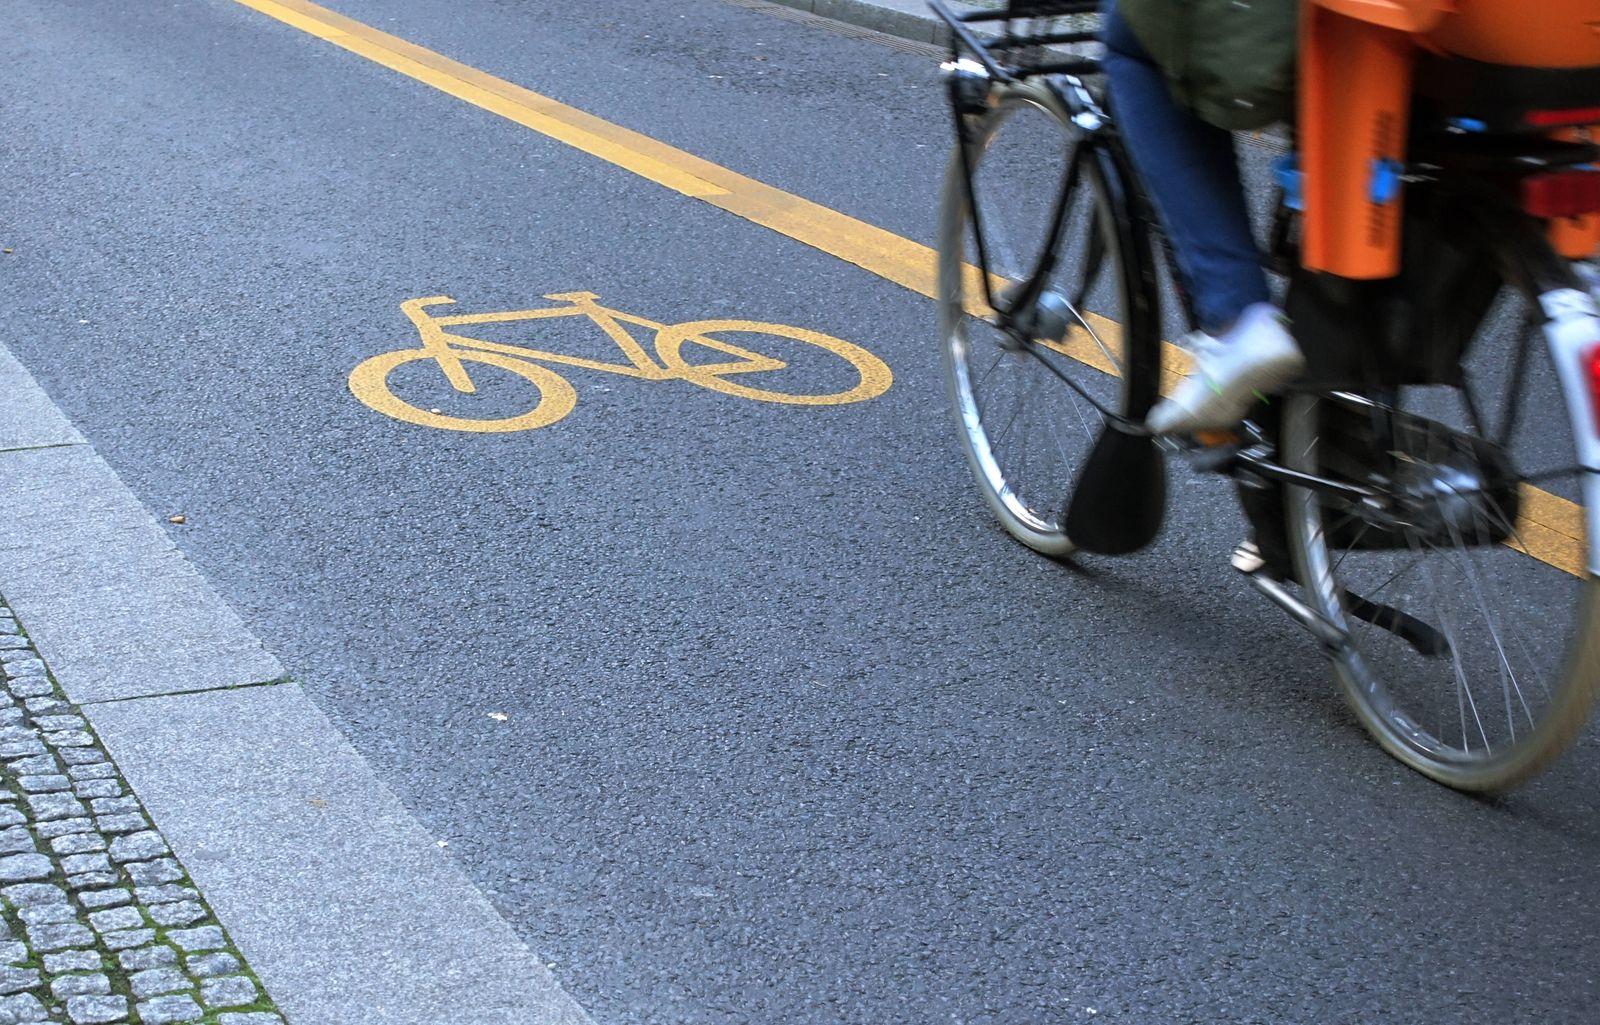 20.11.2020, Berlin, GER - Detailaufnahme: Radfahrer faehrt einen Pop-up-Radweg entlang. (Alltag, alternativ, Anschnitt,